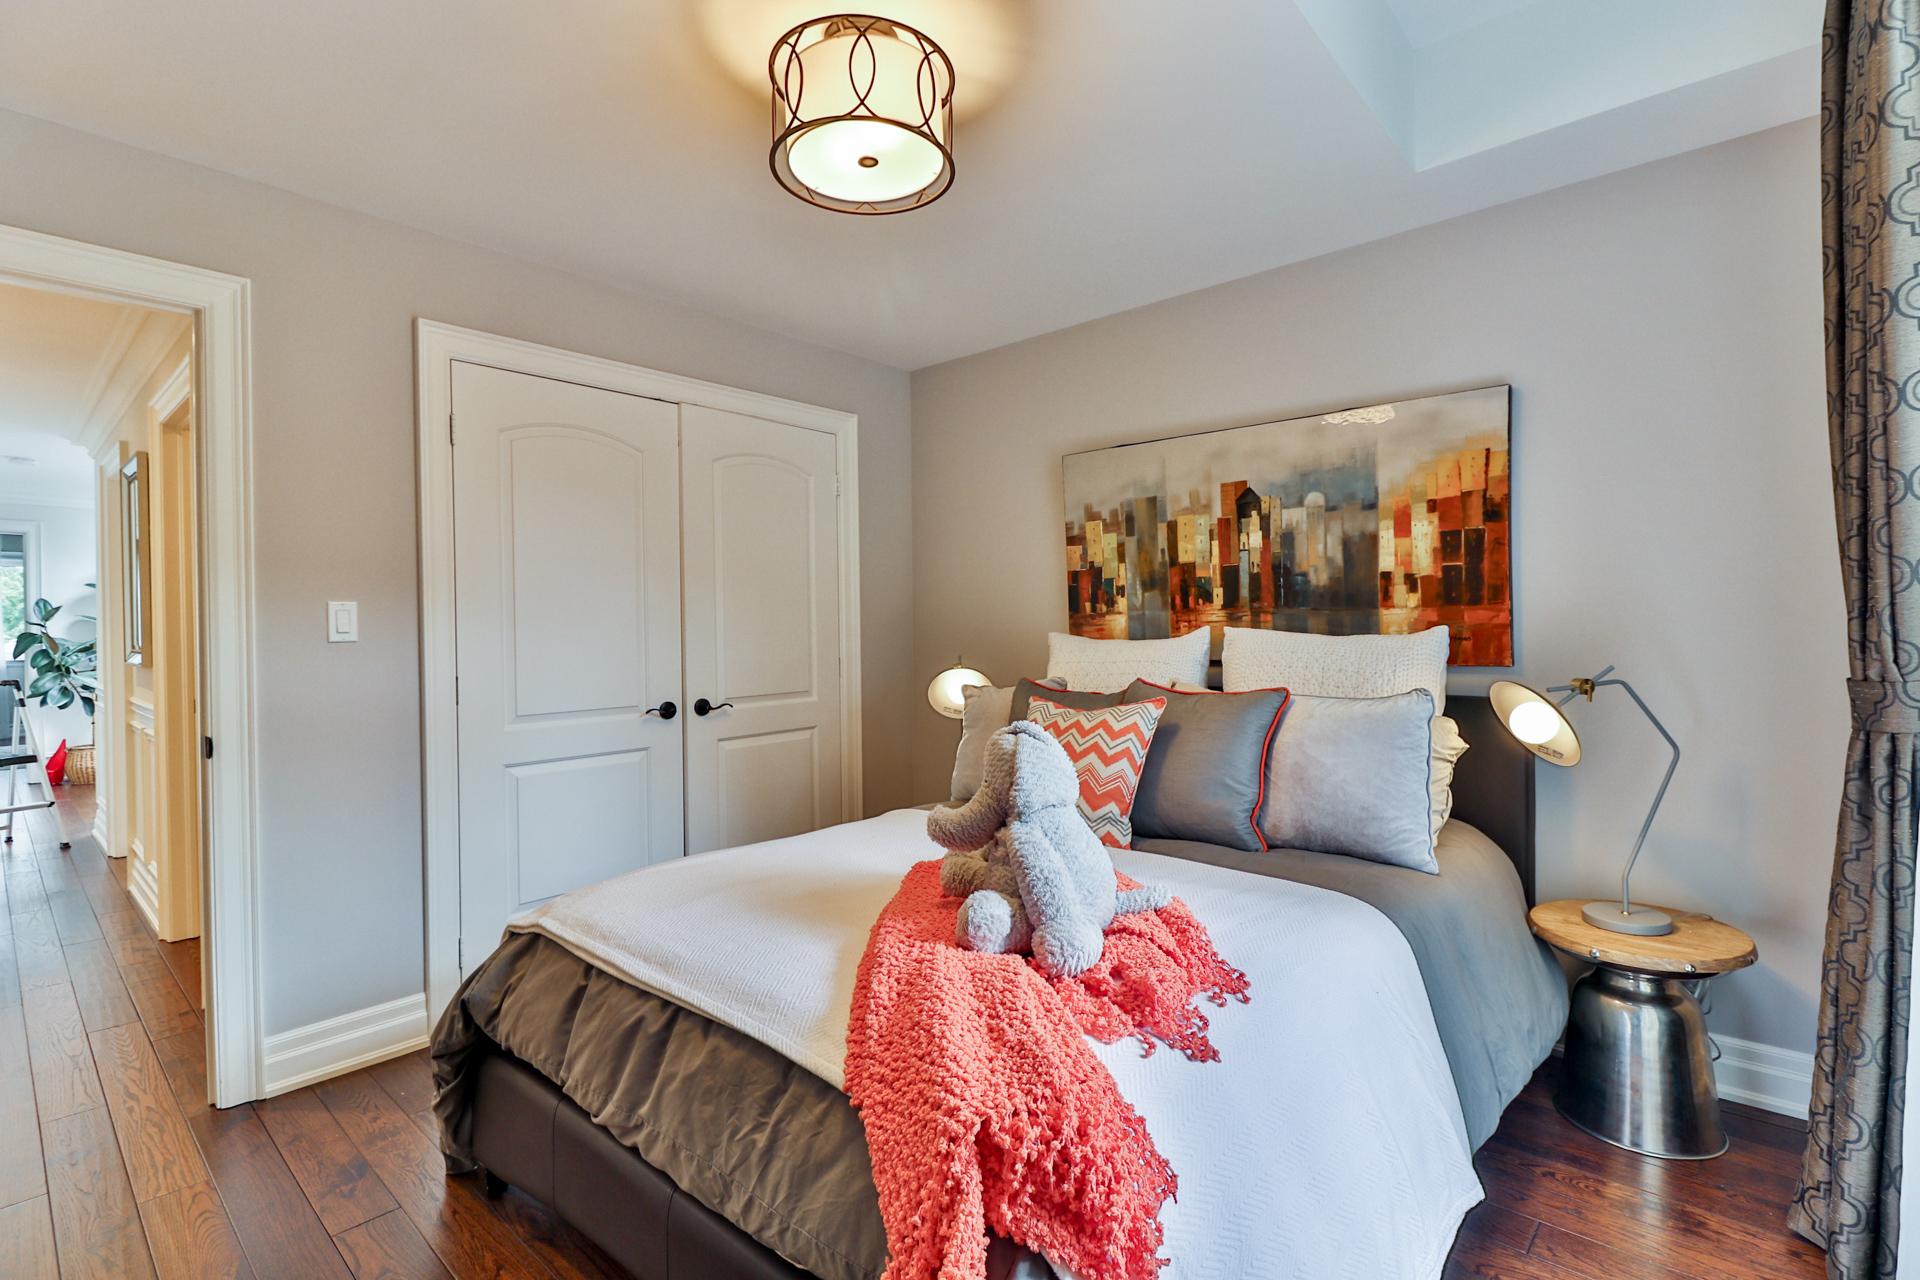 Third Bedroom, 149 Shaver, Etobicoke Home Staging